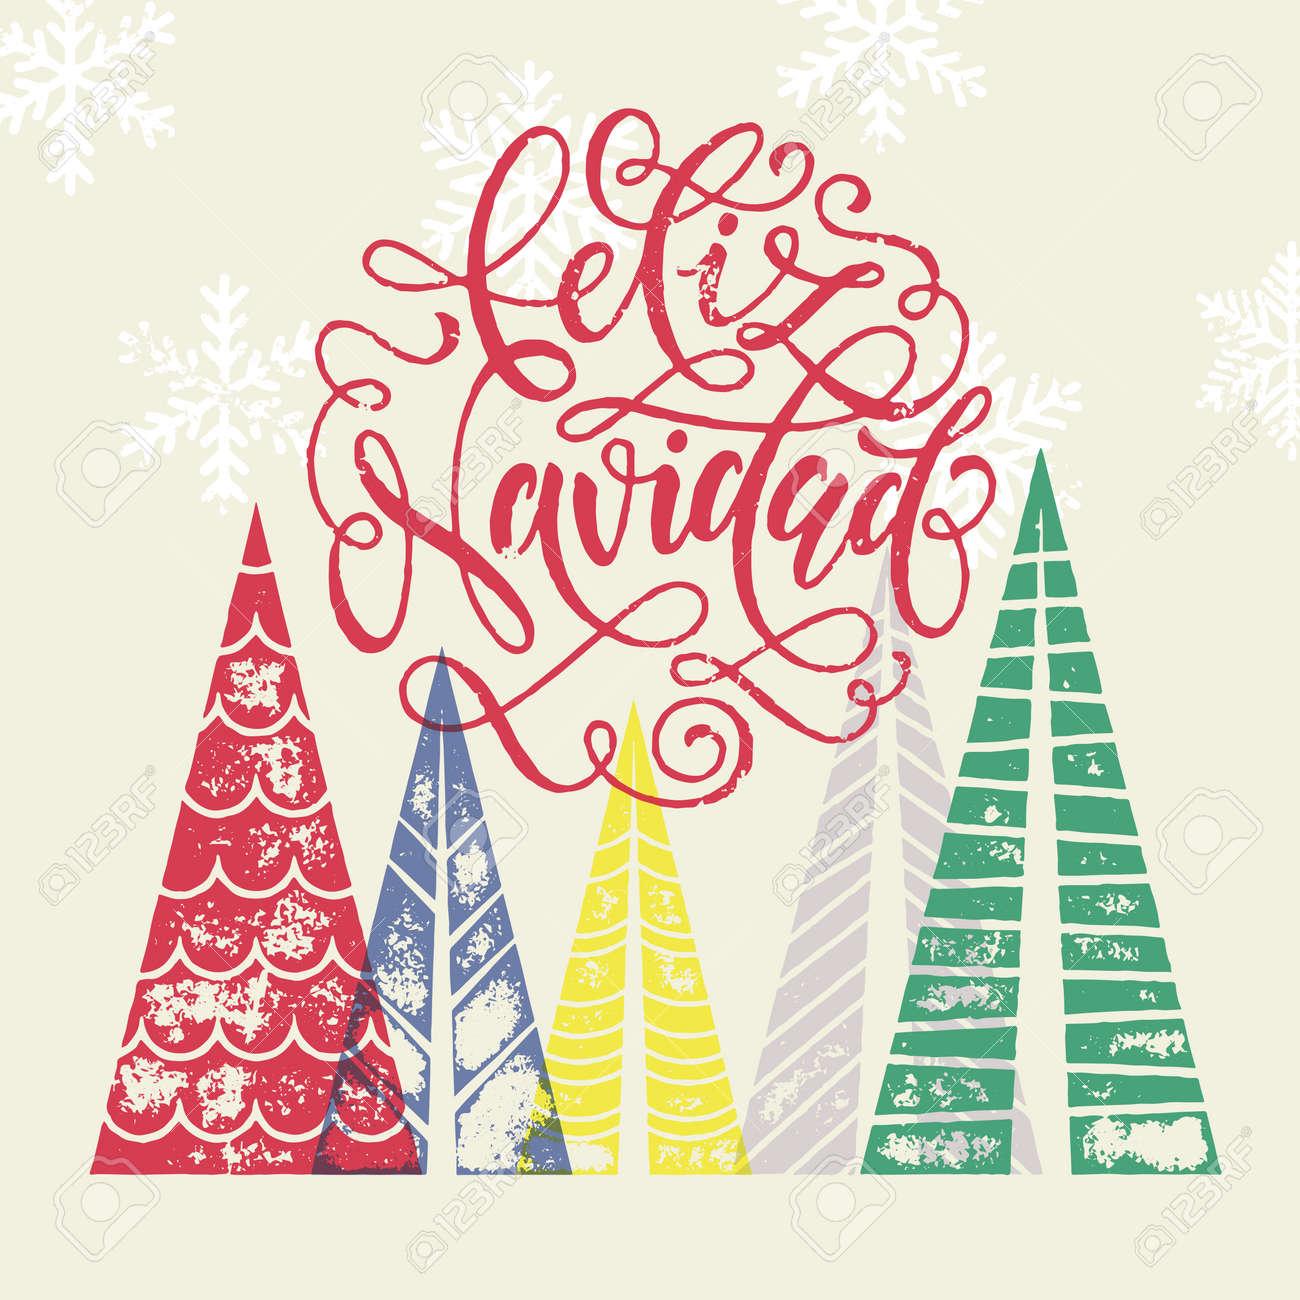 Spanish Winter Holidays Greeting Card With Text Feliz Navidad